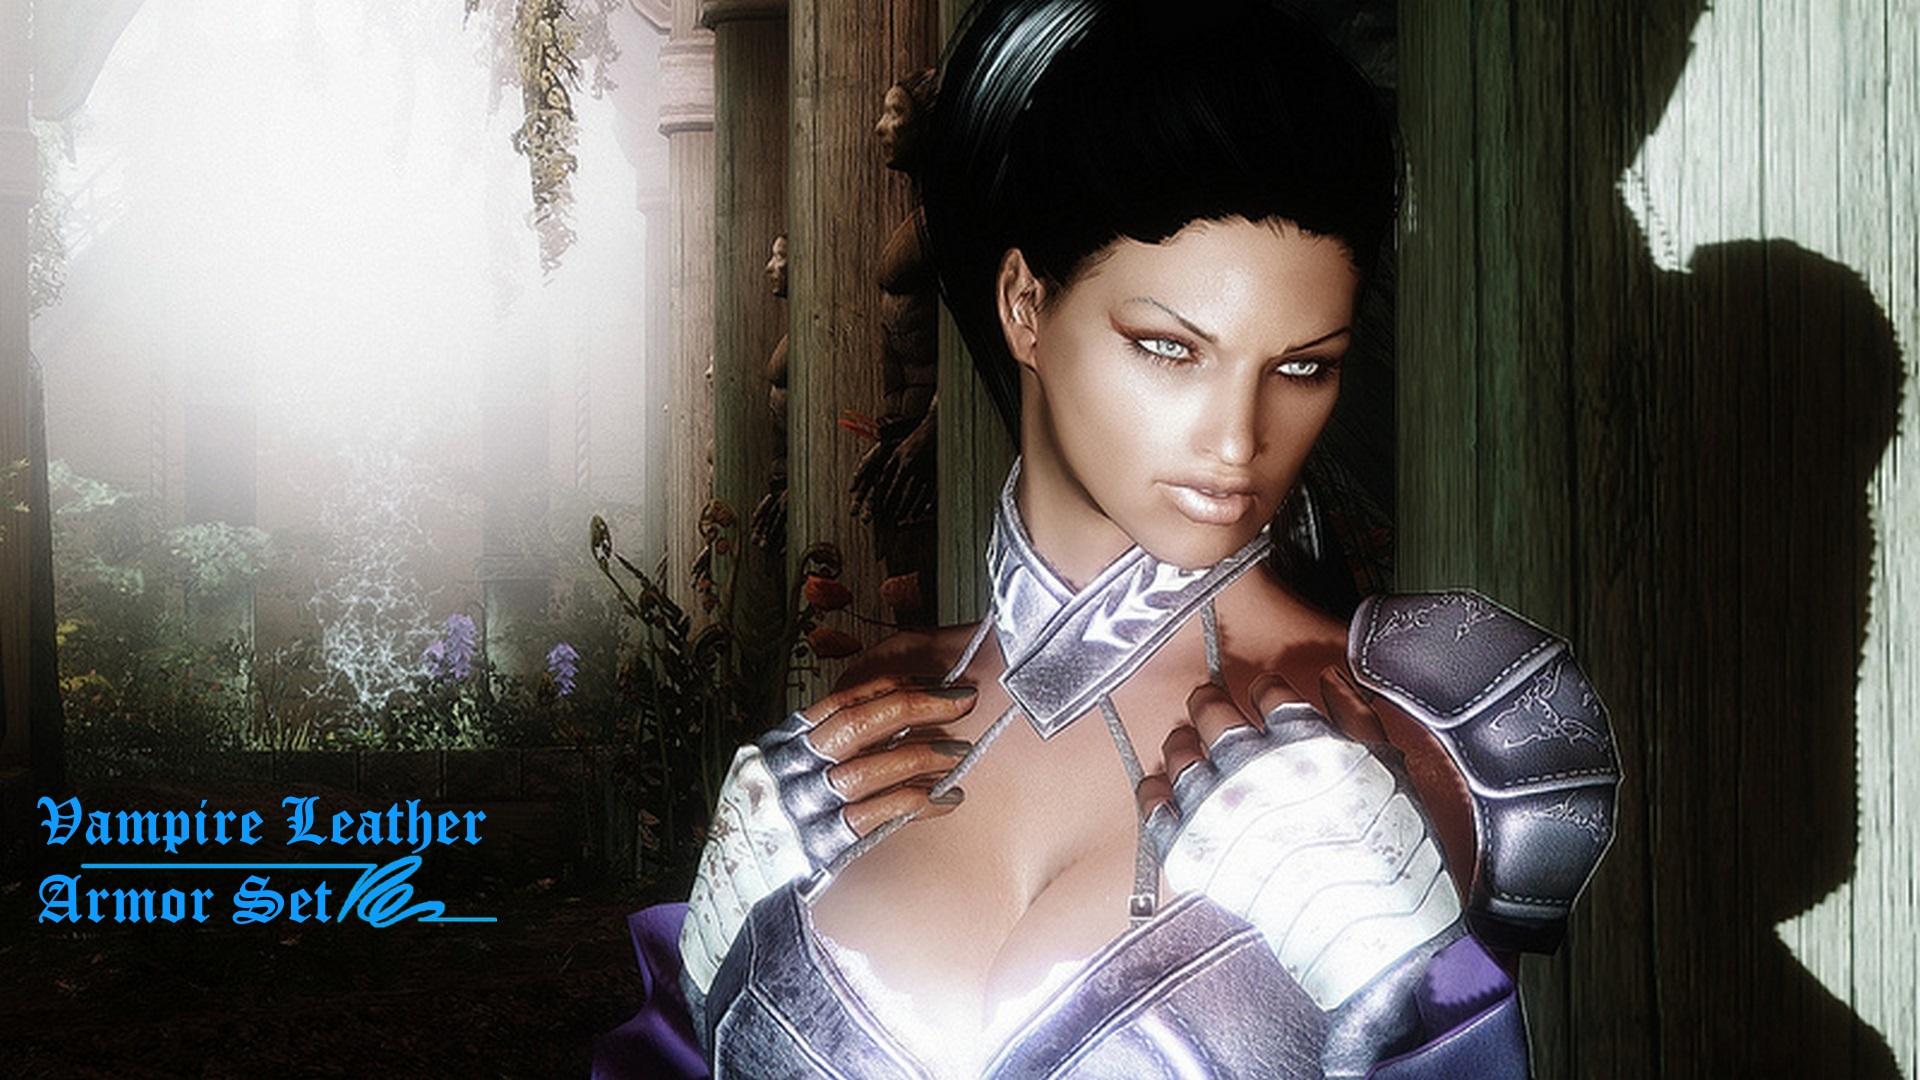 Vampire_leather_armor_set_L.jpg